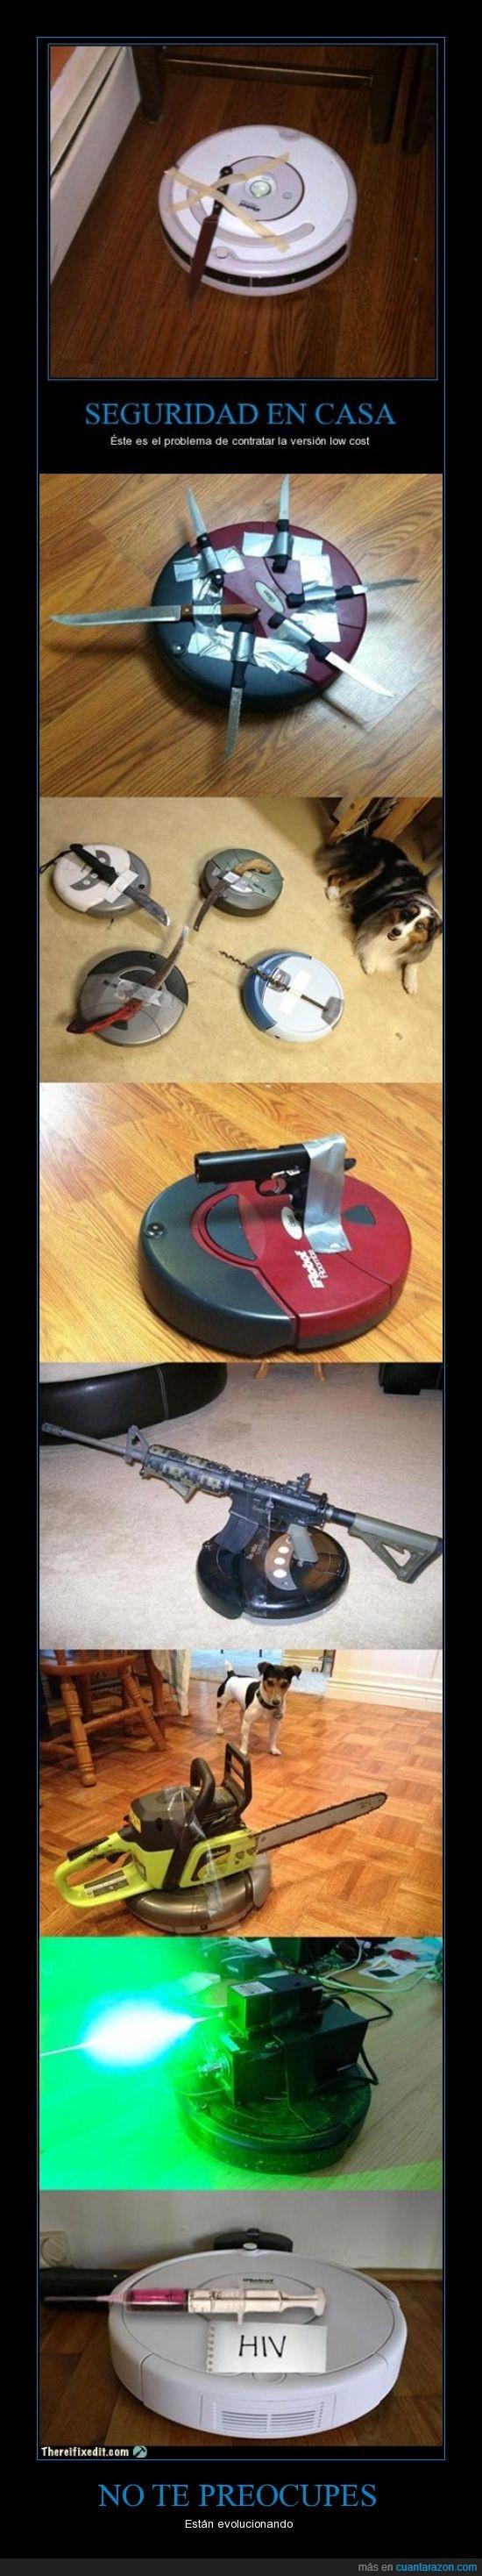 cuchillo,domótica avanzada,Doomba,jeriguilla,pistola,roomba,seguridad casera,sida